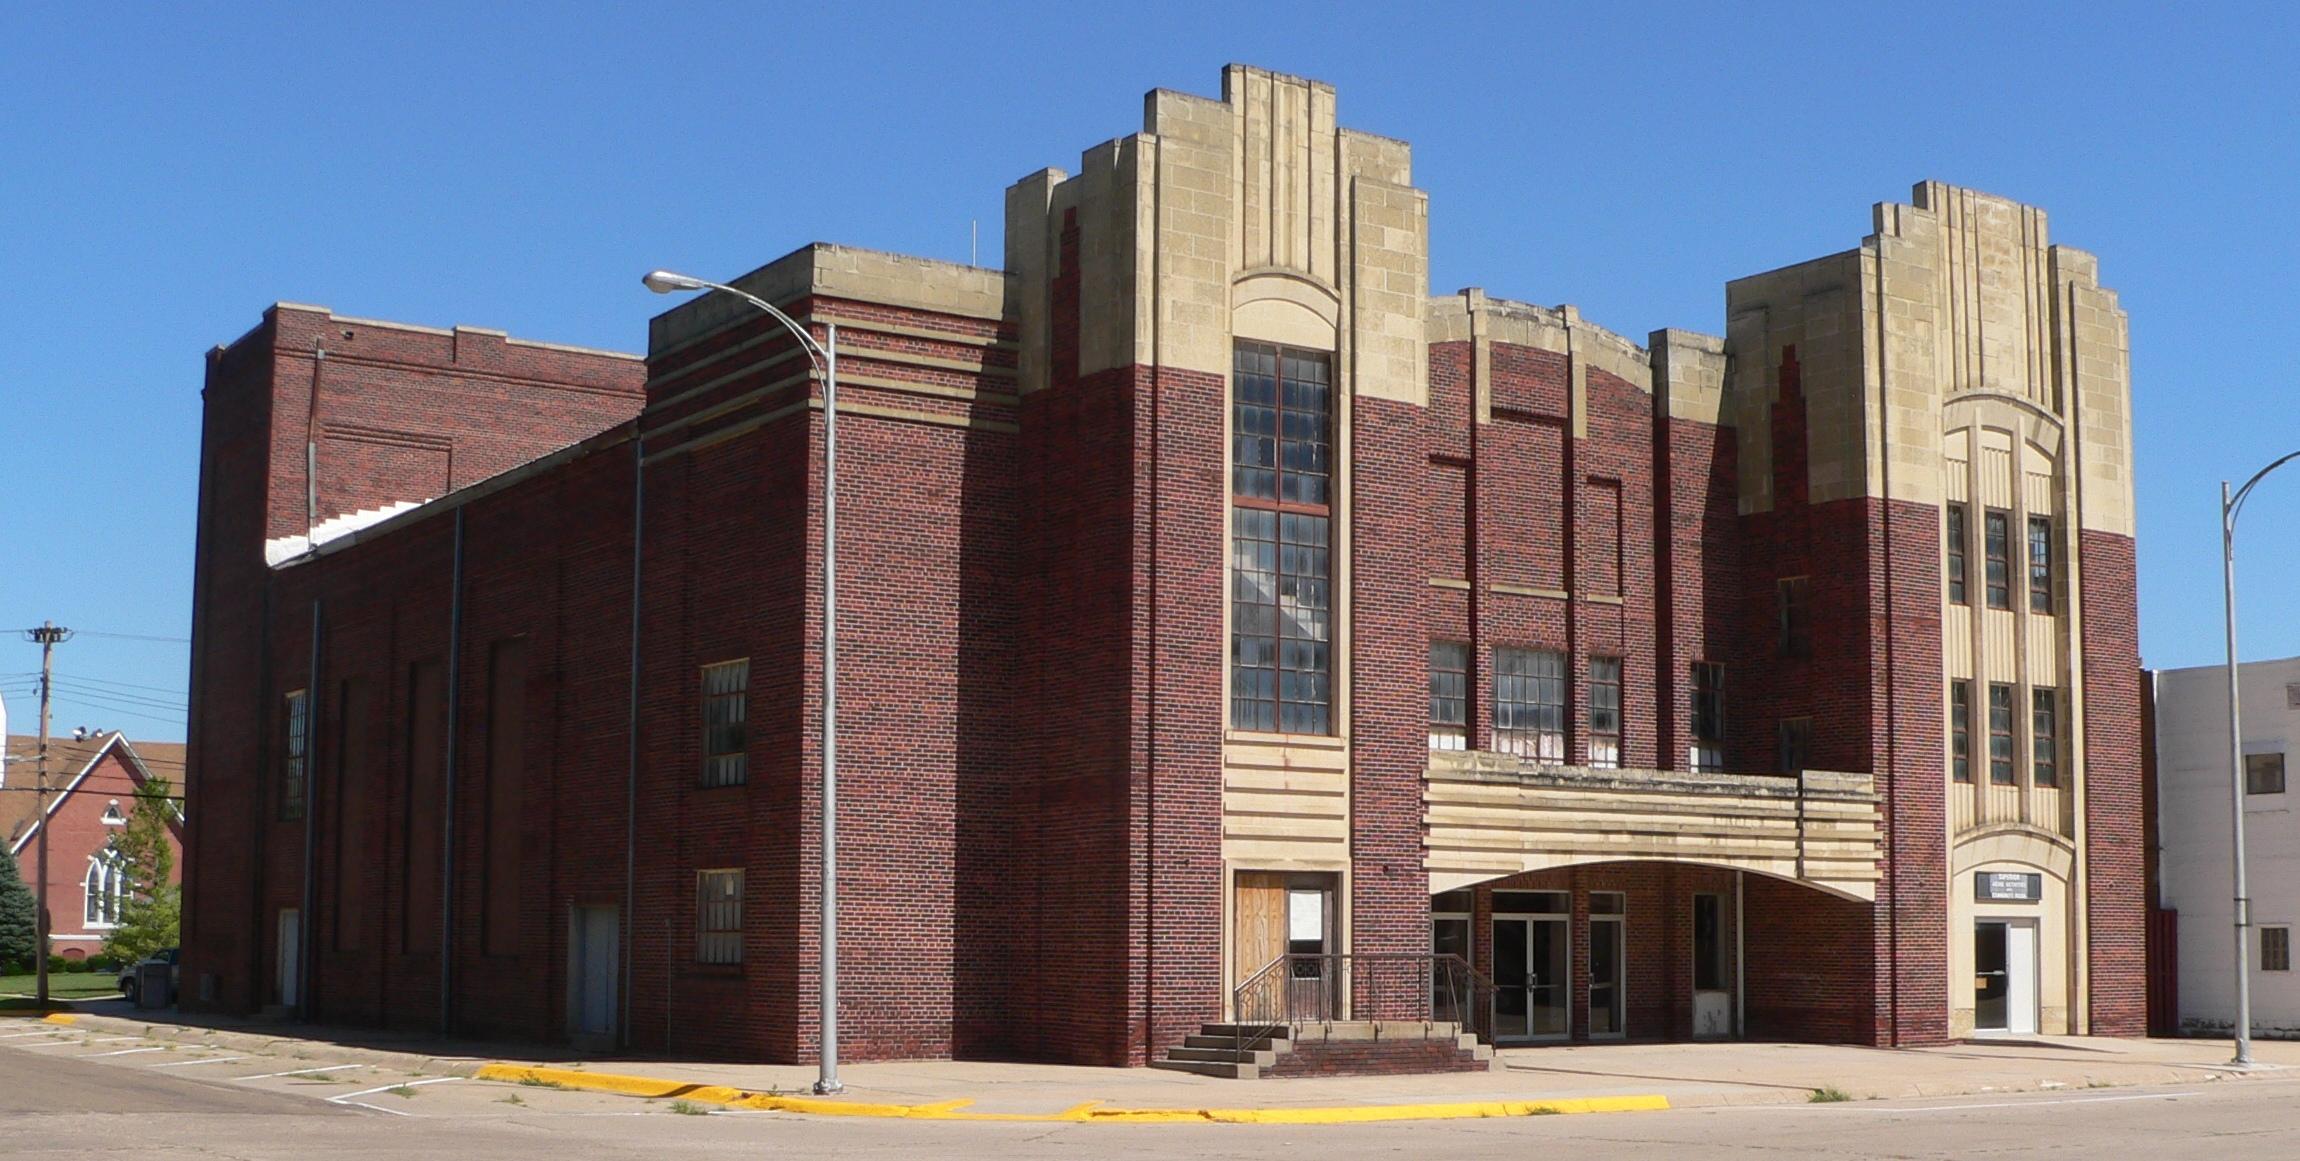 City Line Avenue >> File:Superior, Nebraska auditorium from NW.jpg - Wikimedia Commons